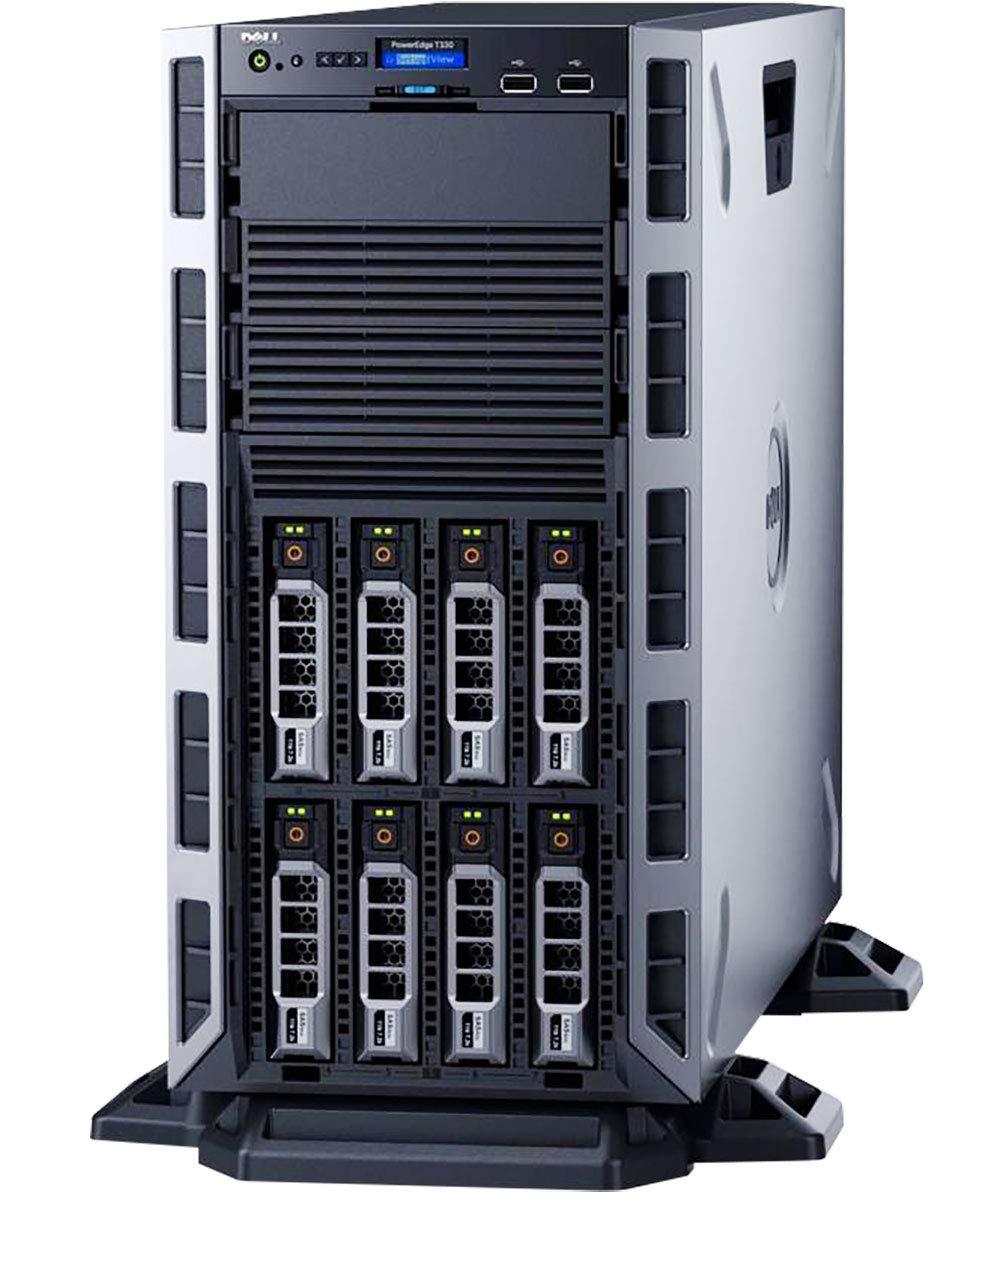 PowerEdge T330 Tower Server, Windows 2019 STD OS, Intel Xeon E3-1230 v6 Quad-Core 3.4GHz 8MB, 32GB DDR4 RAM, 8TB Storage, RAID, Single PSU, 3 Year Warranty by Aventis Systems Inc (Image #4)